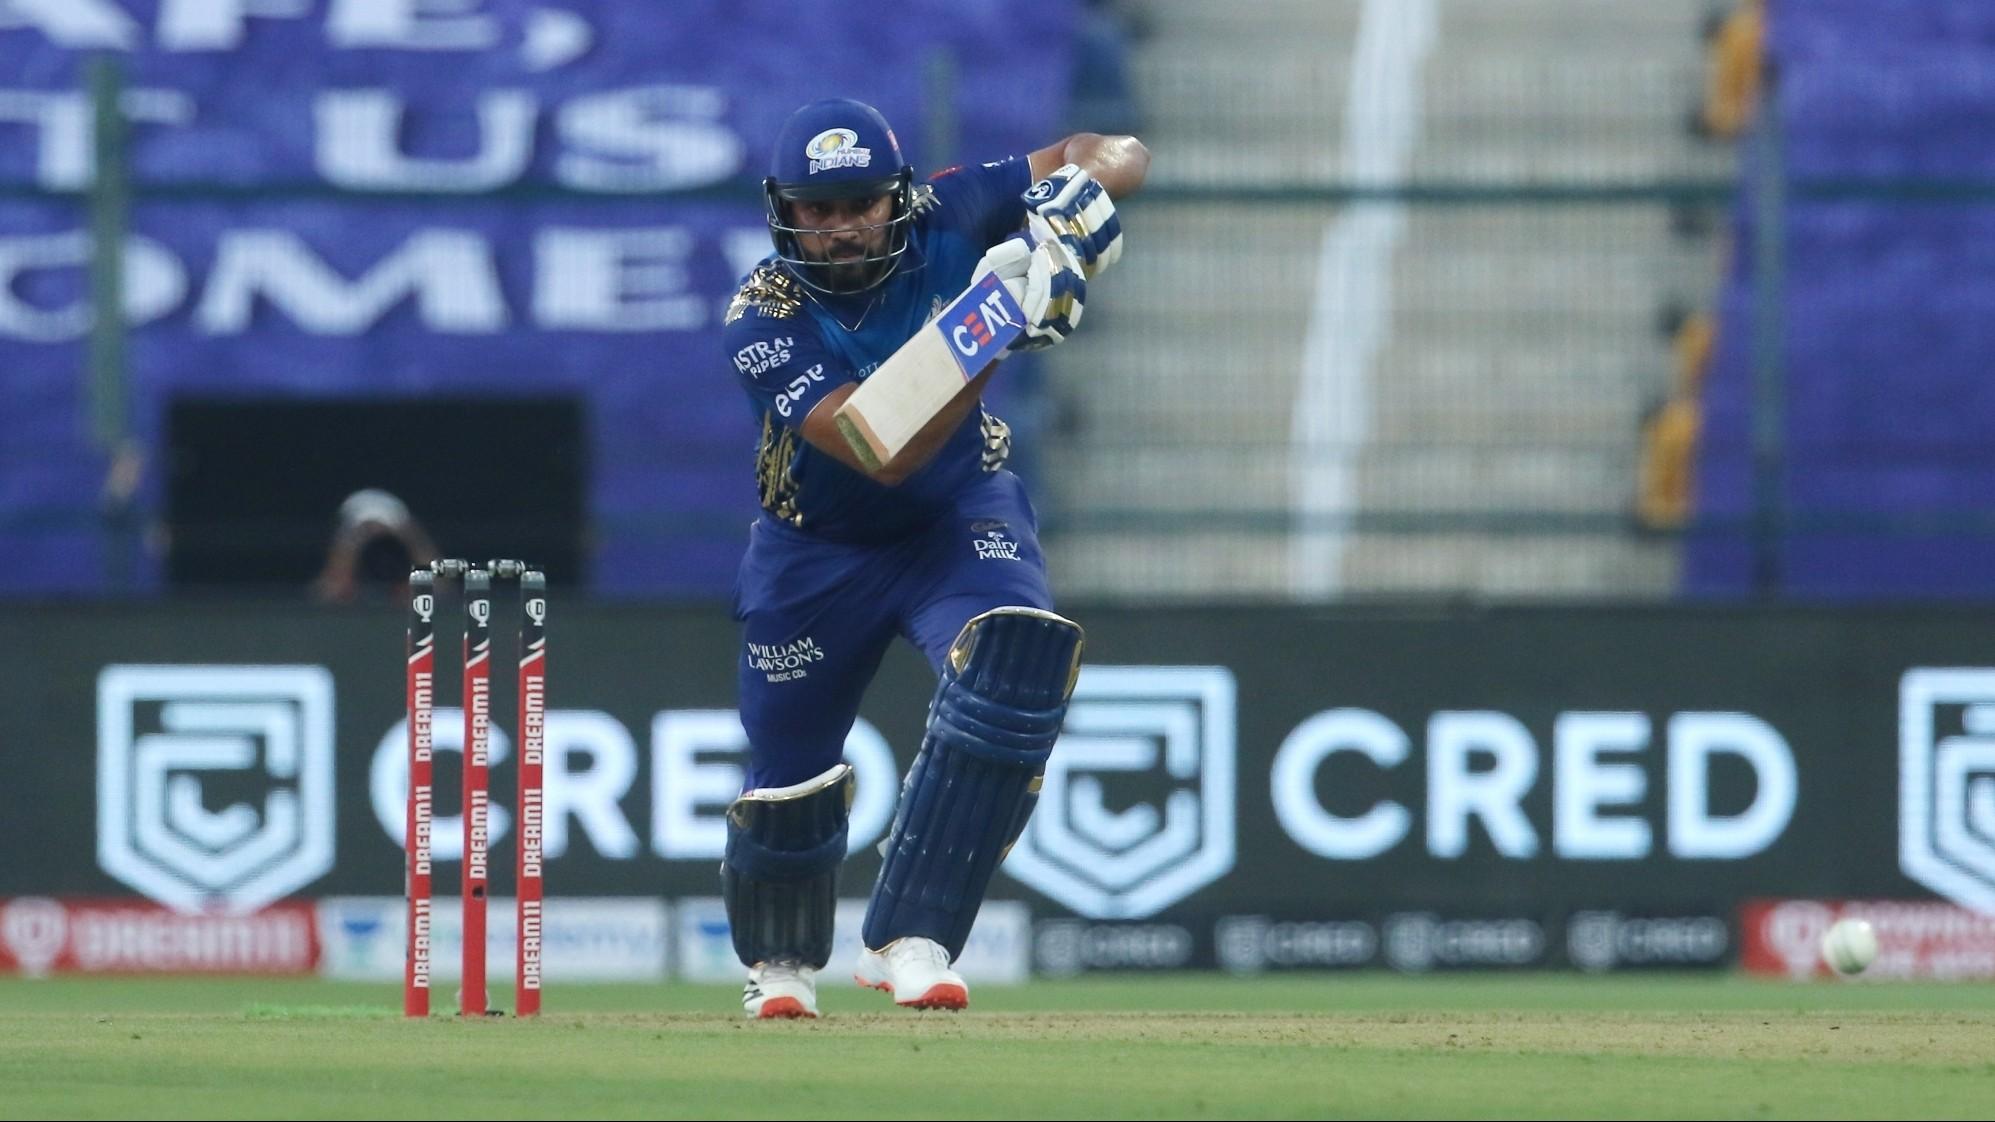 IPL 2020: Rohit Sharma blames batsmen after MI's 5-wicket loss to CSK in the tournament opener